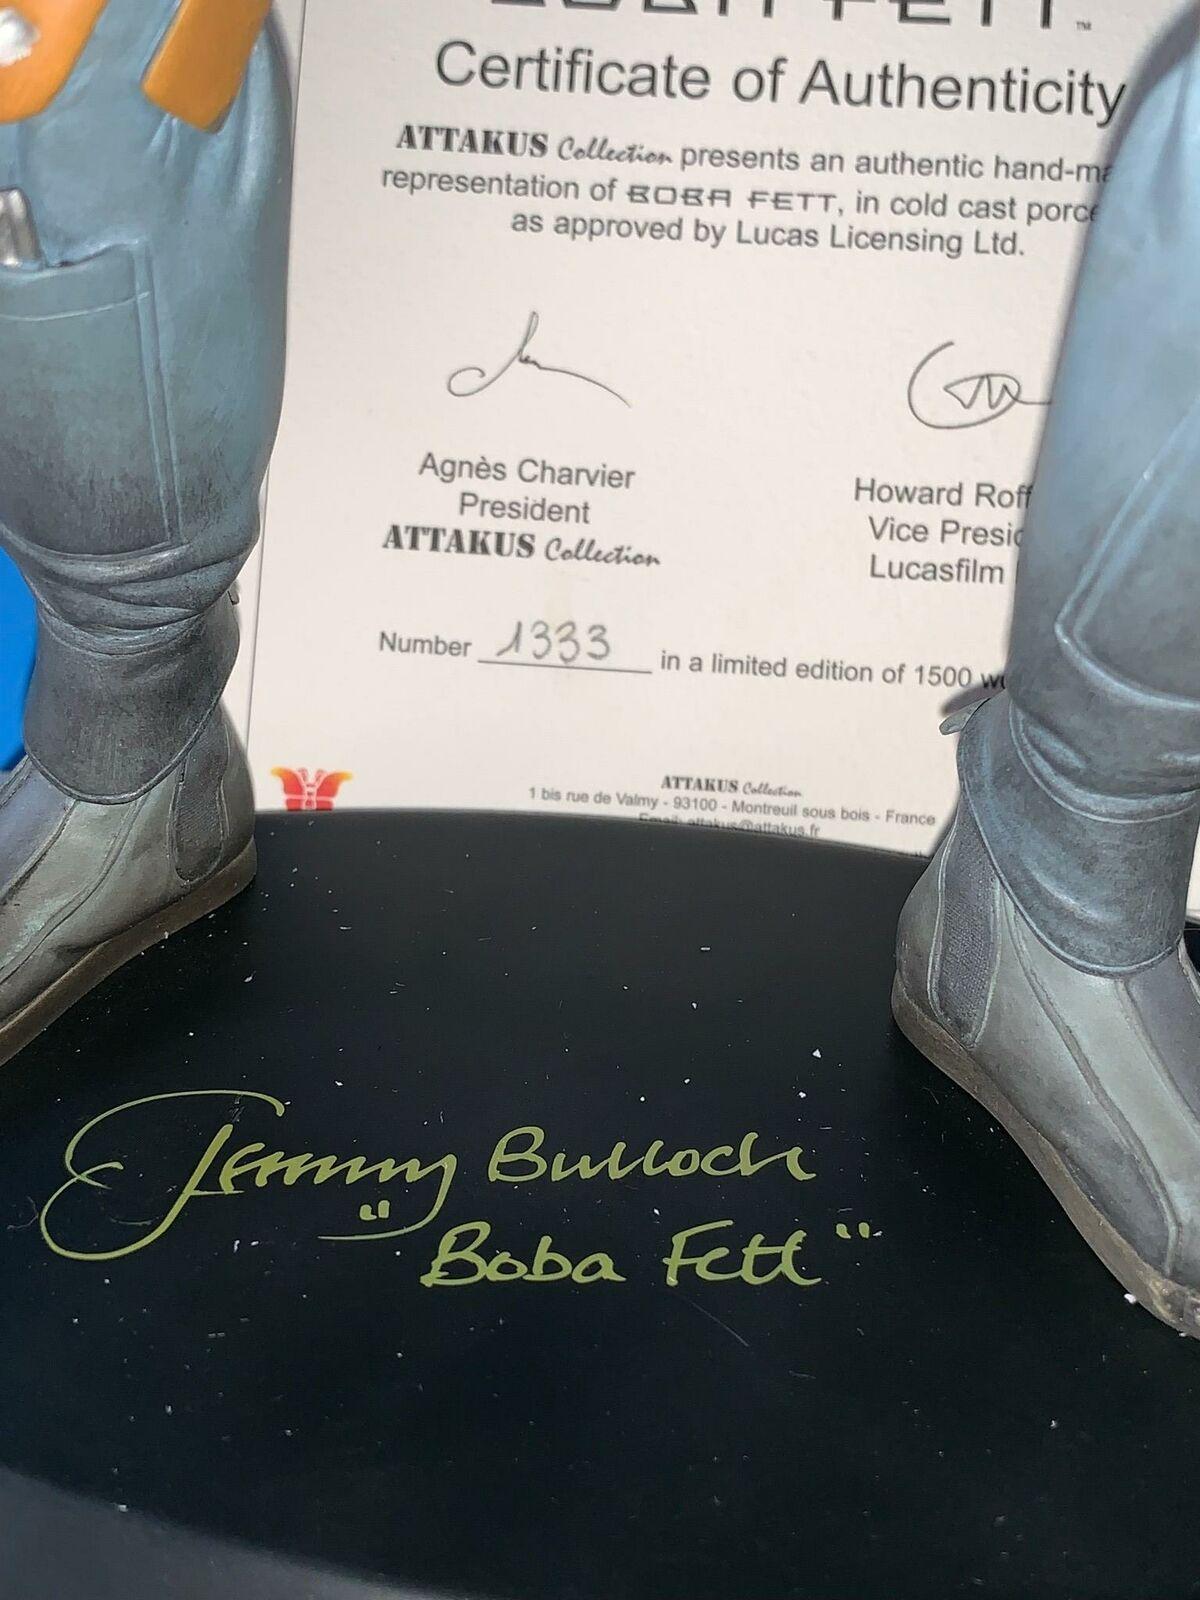 He SIGNED 2000 gree gree gree Attakus BOBA FETT STATUE MIB UNDISPLAYED Jeremy Bulloch 8da736